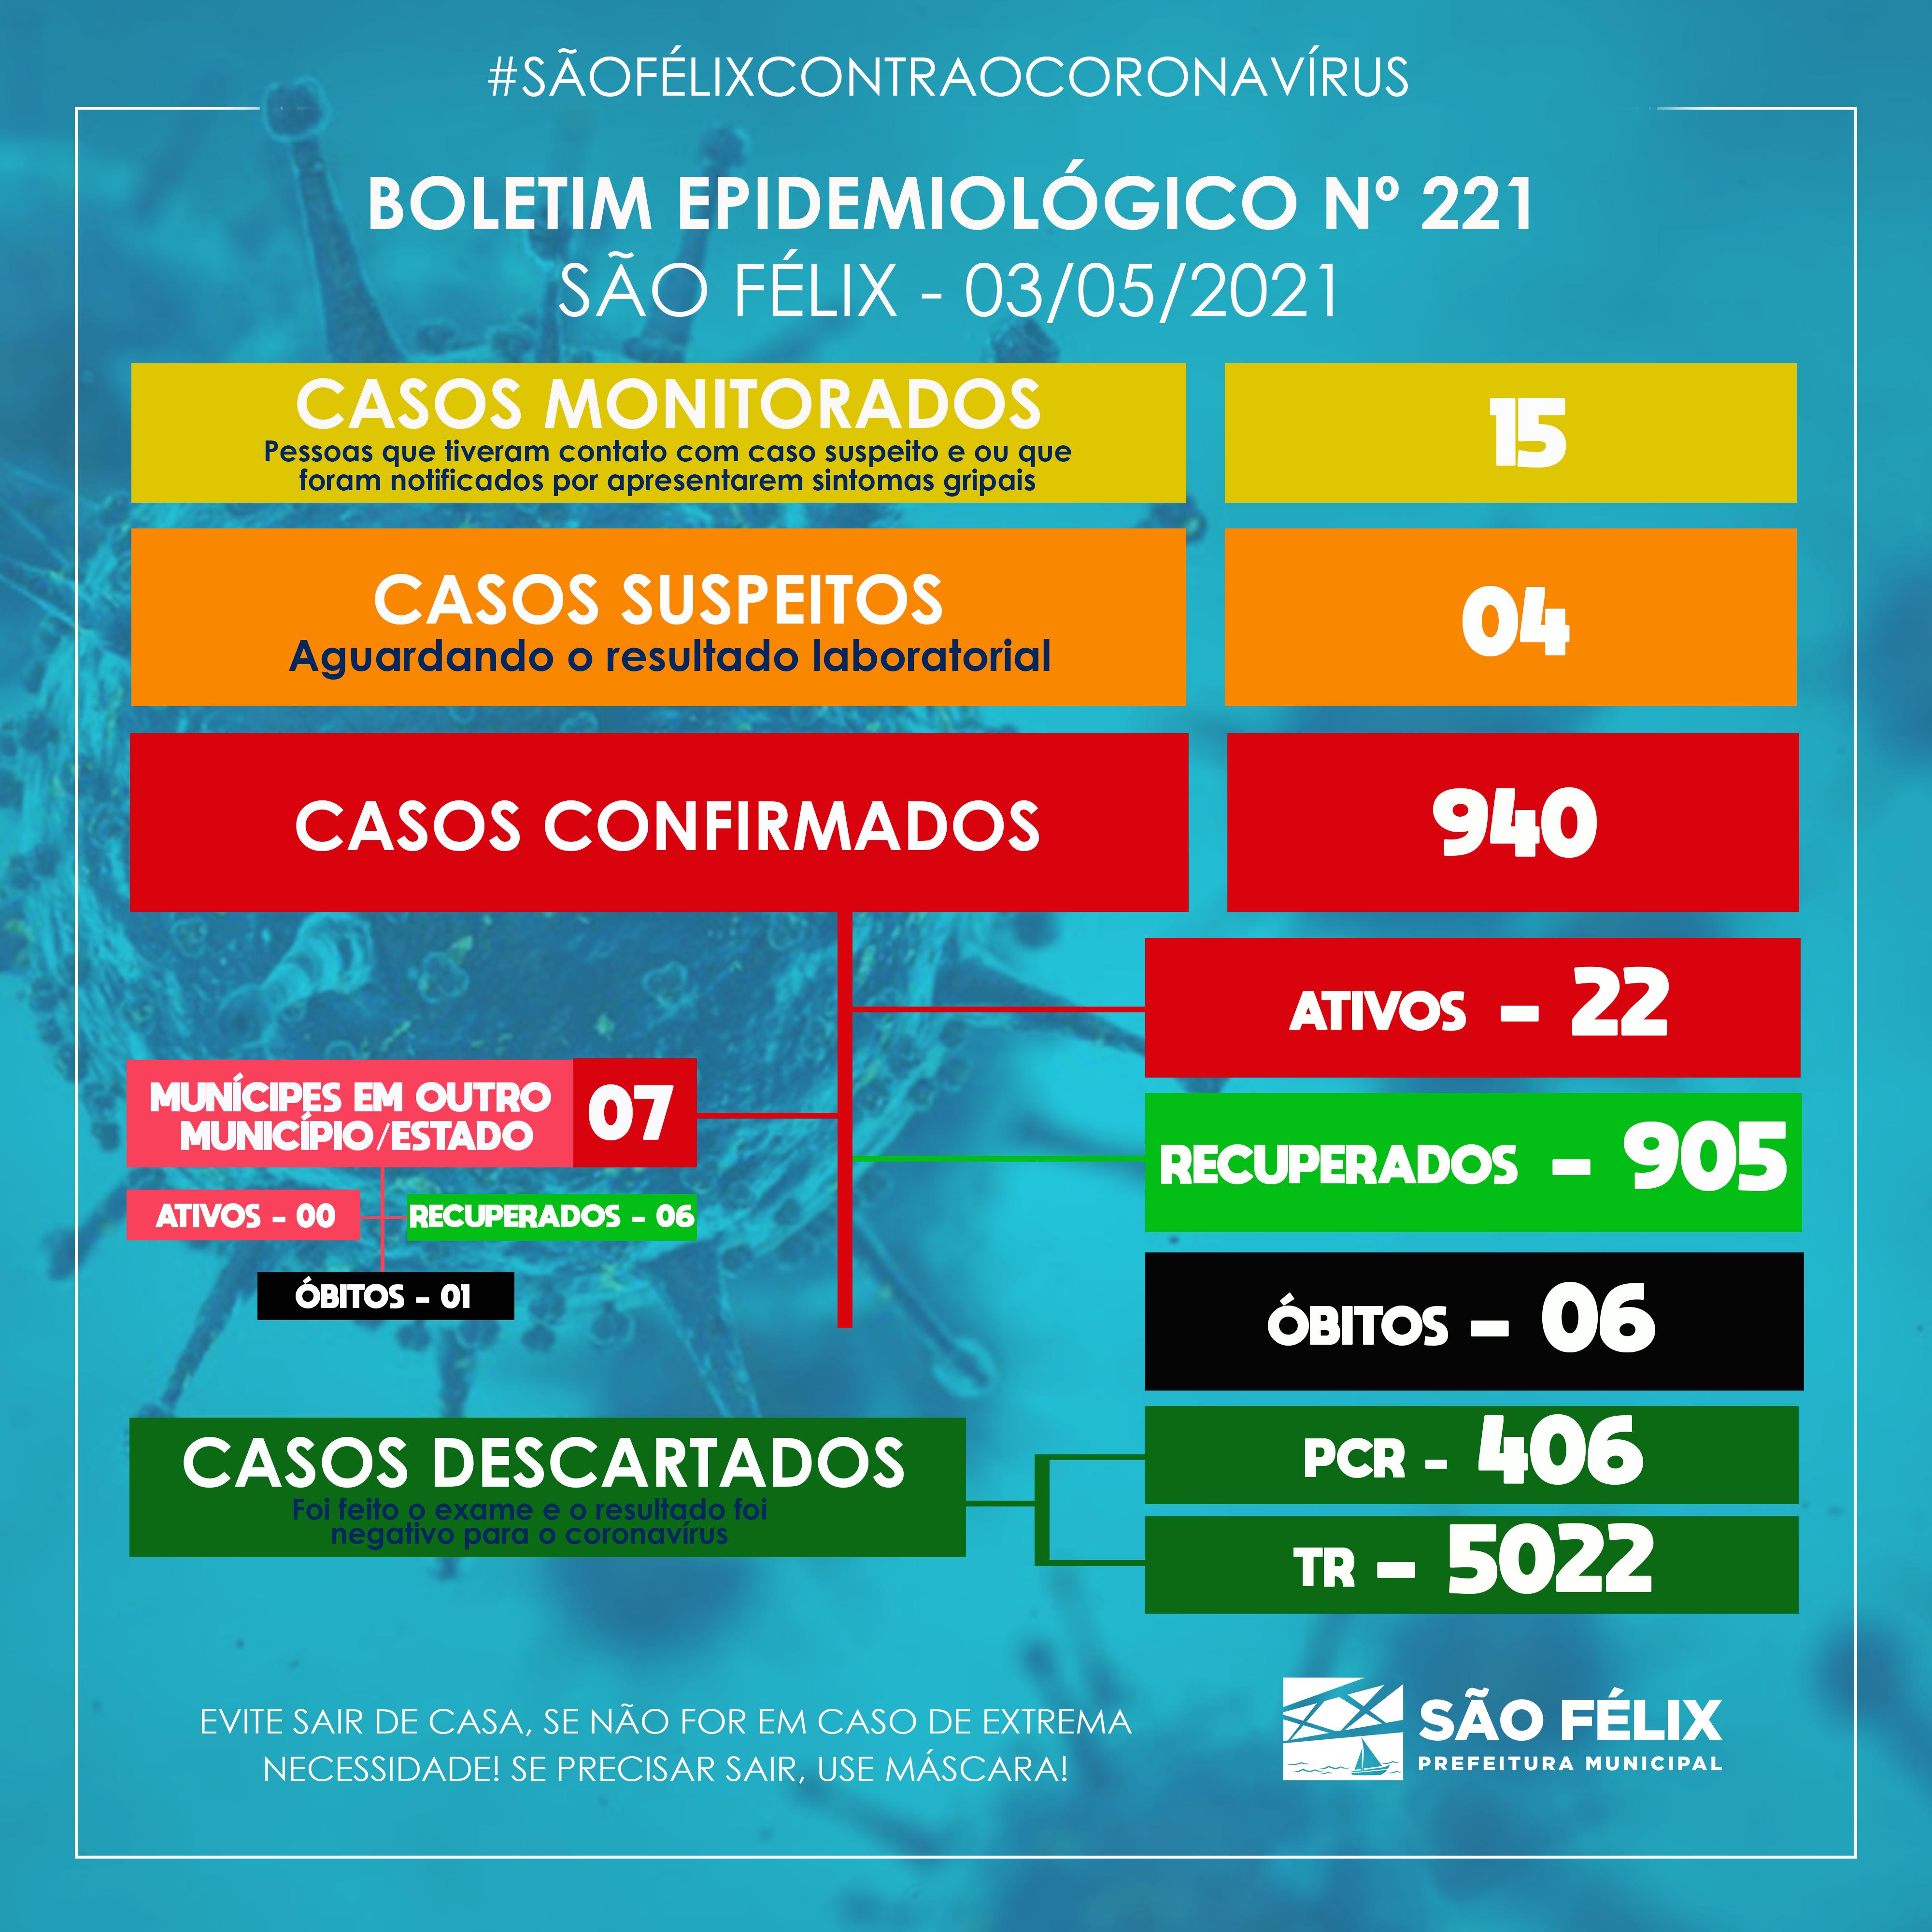 BOLETIM EPIDEMIOLÓGICO Nº 221